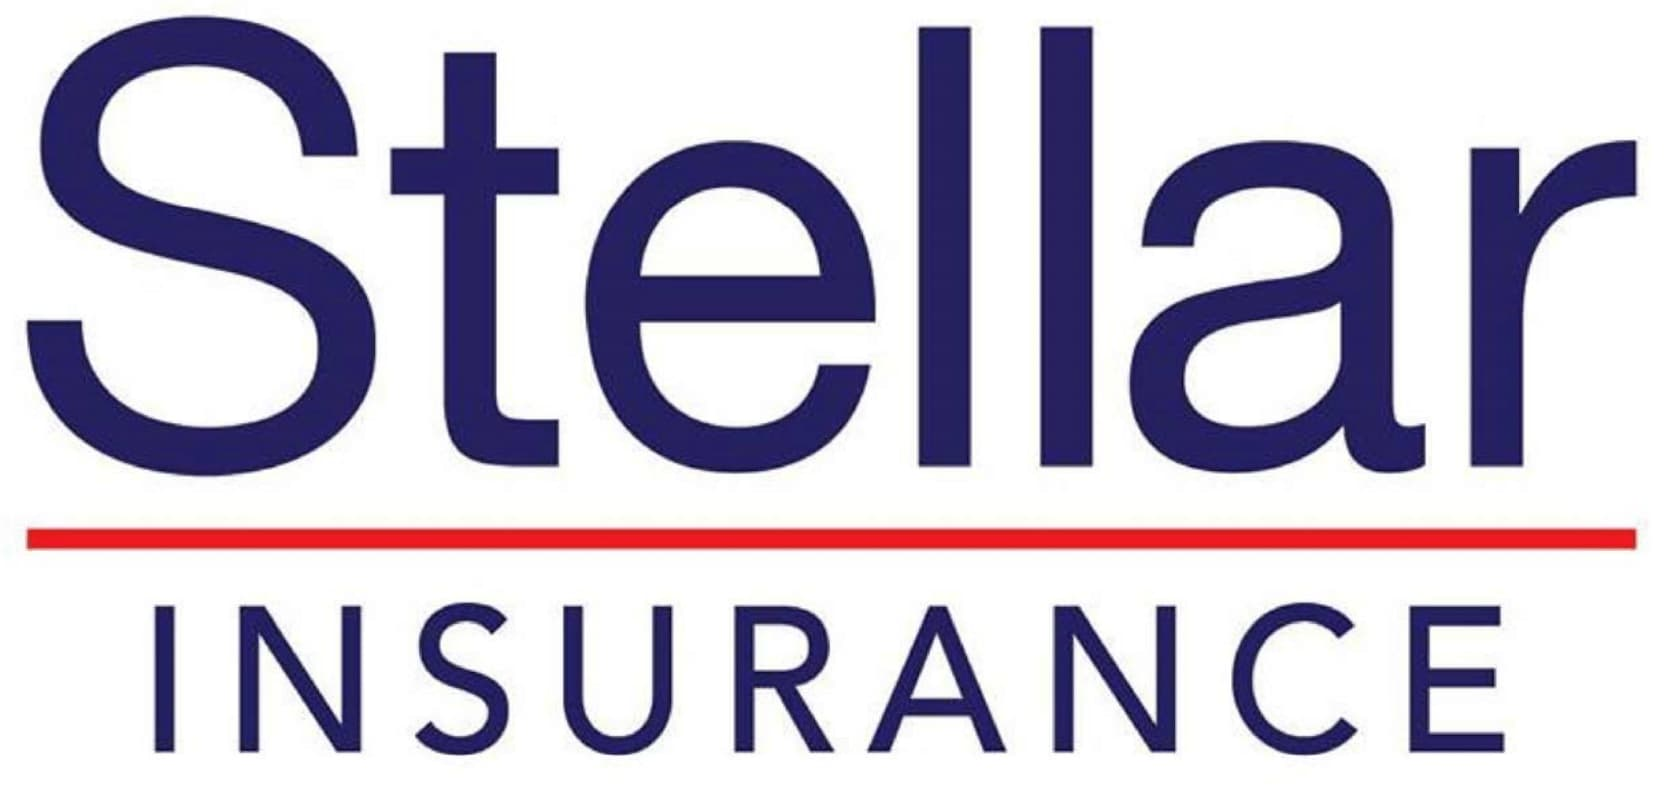 Stellar Insurance